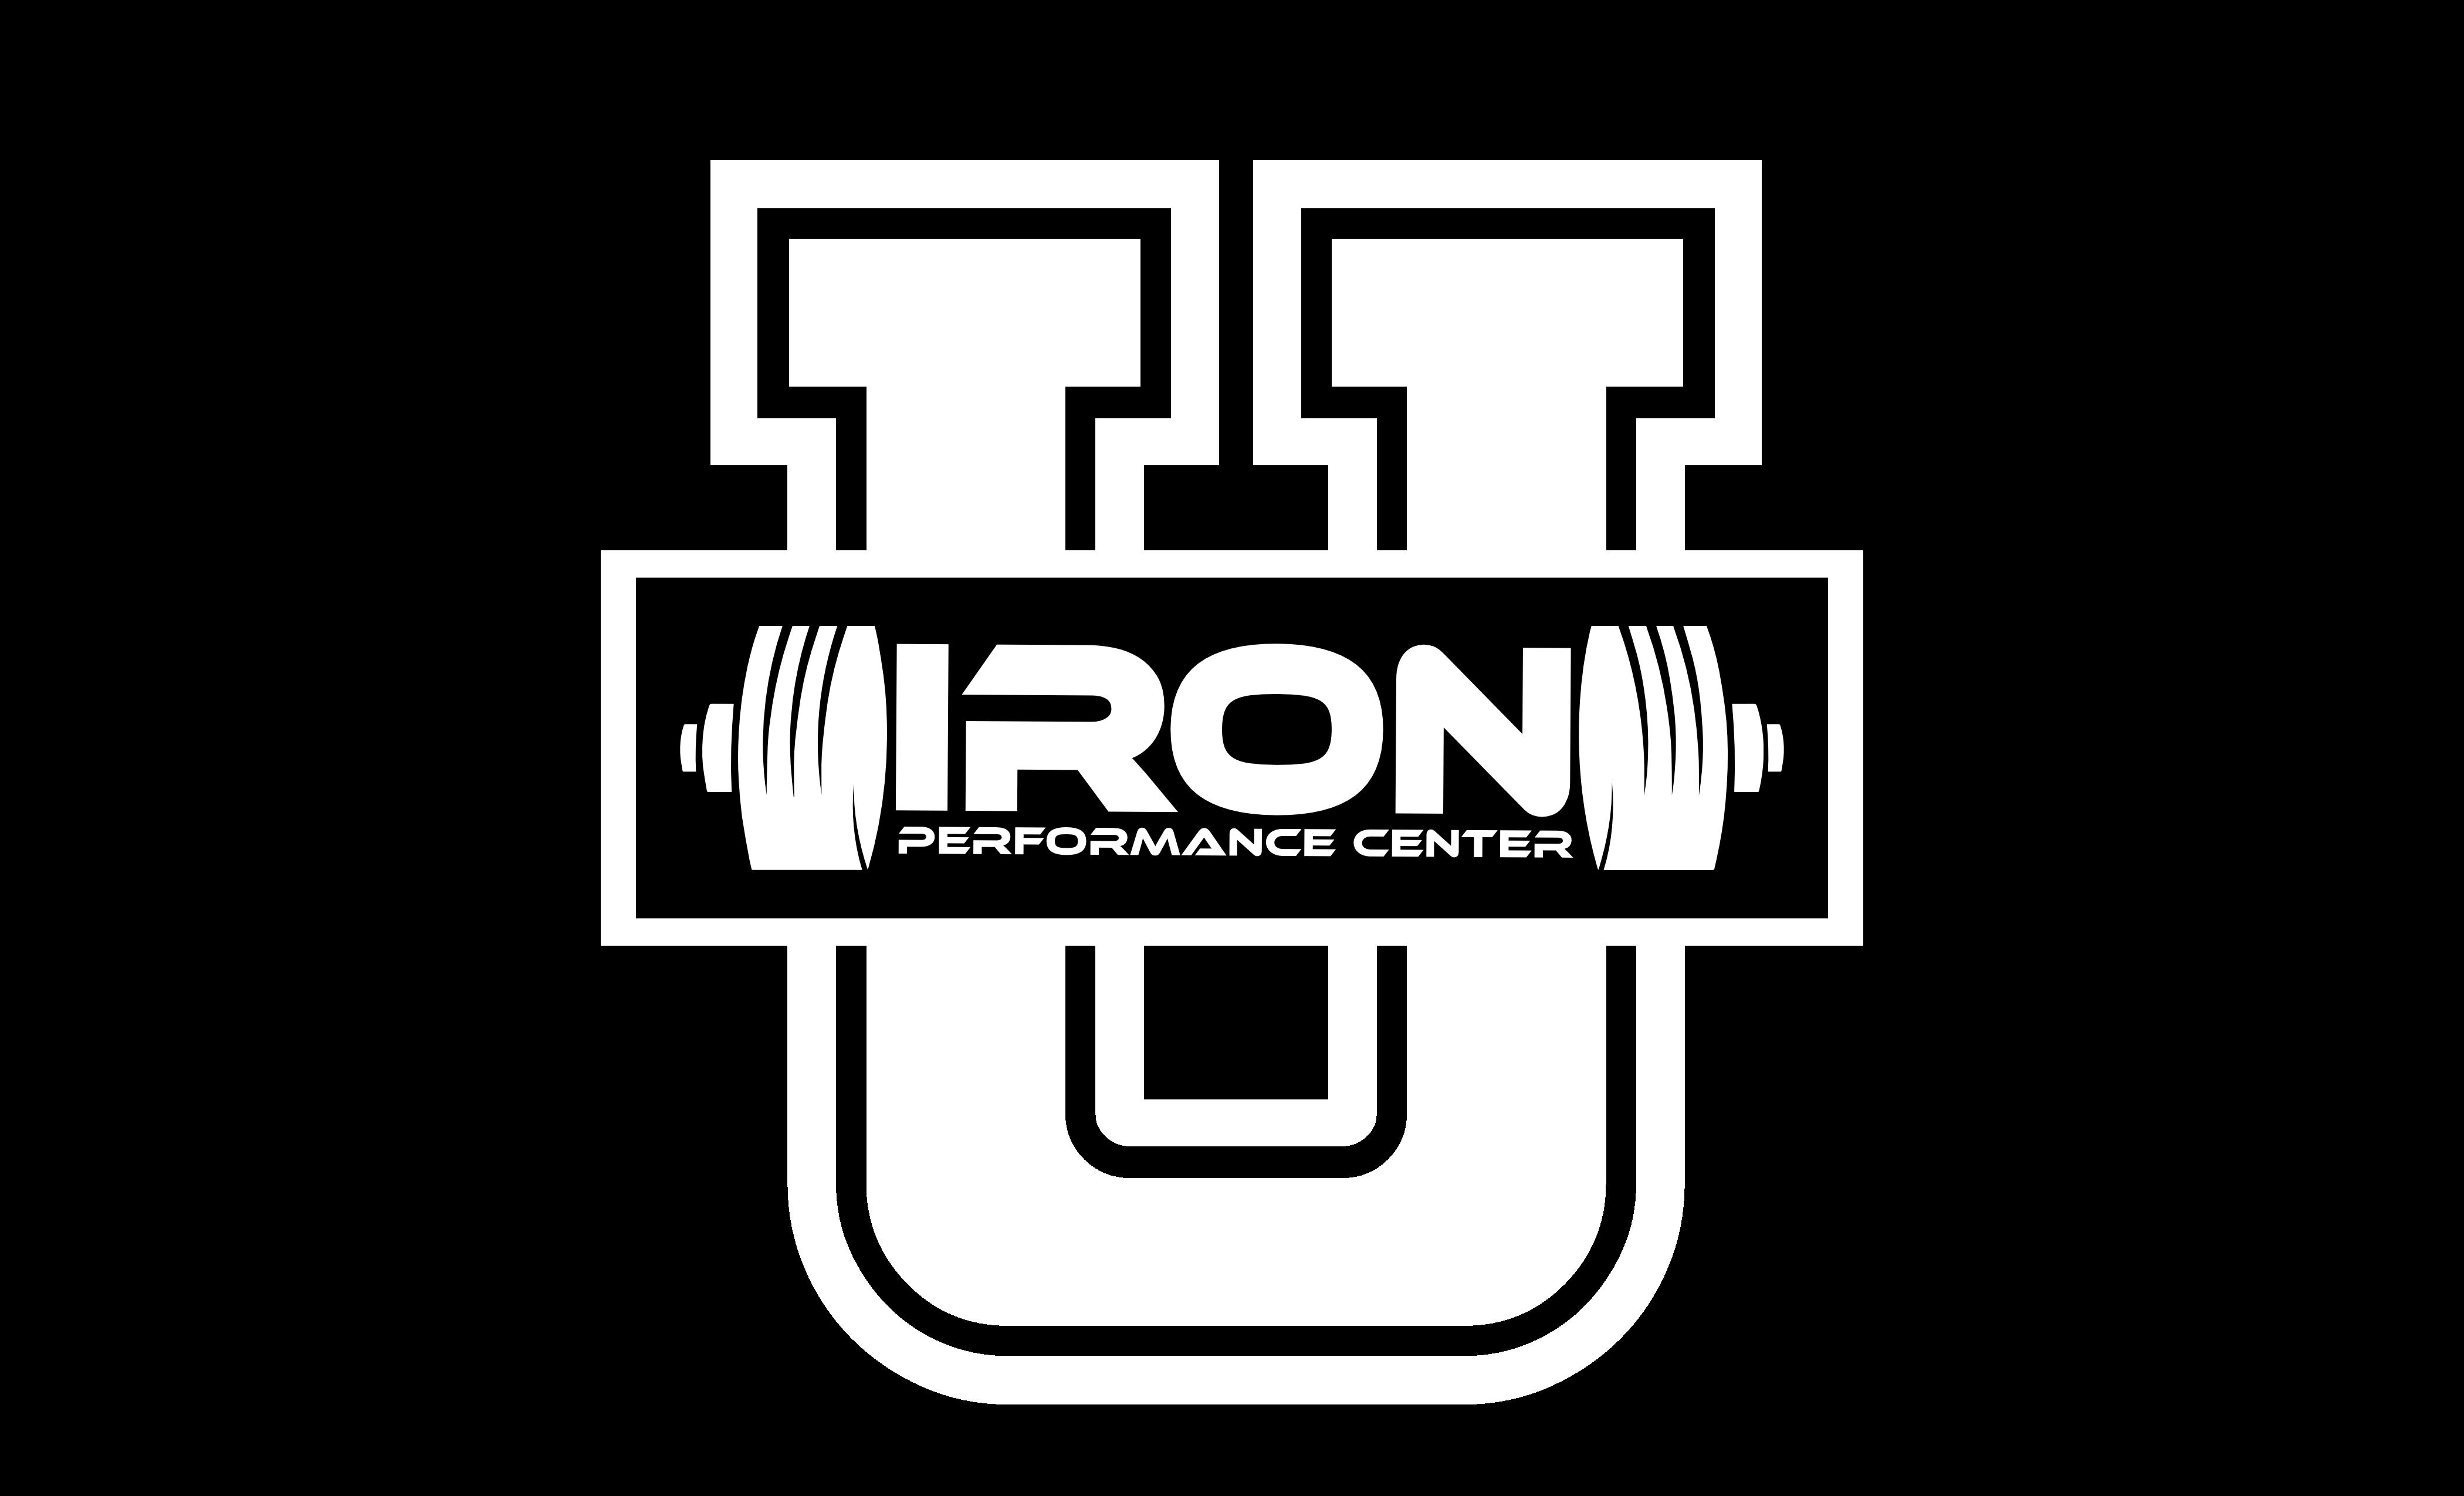 iron performance center university logo